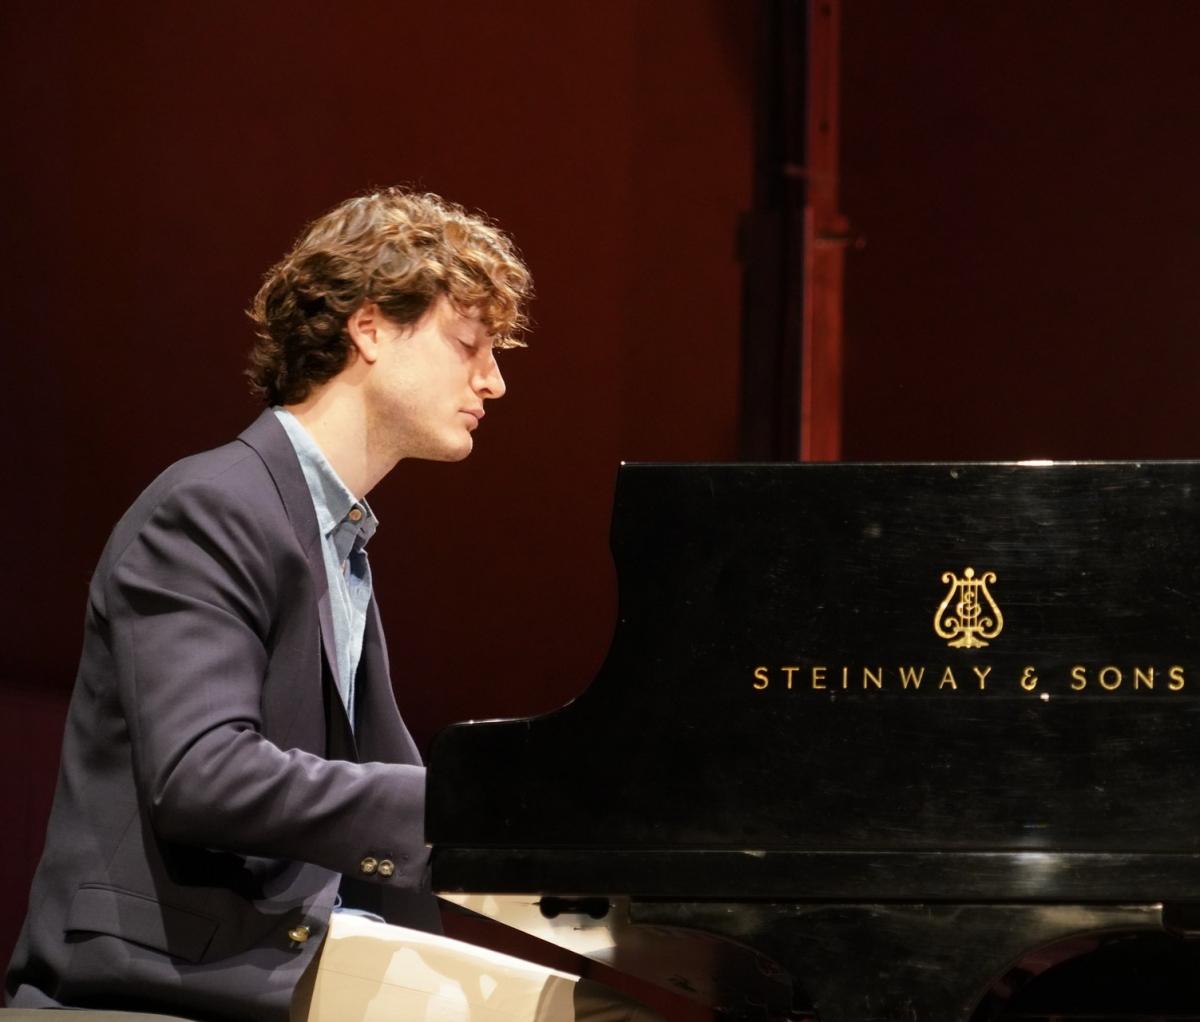 zMusique HAUT1 Thomas Enhco piano.jpg